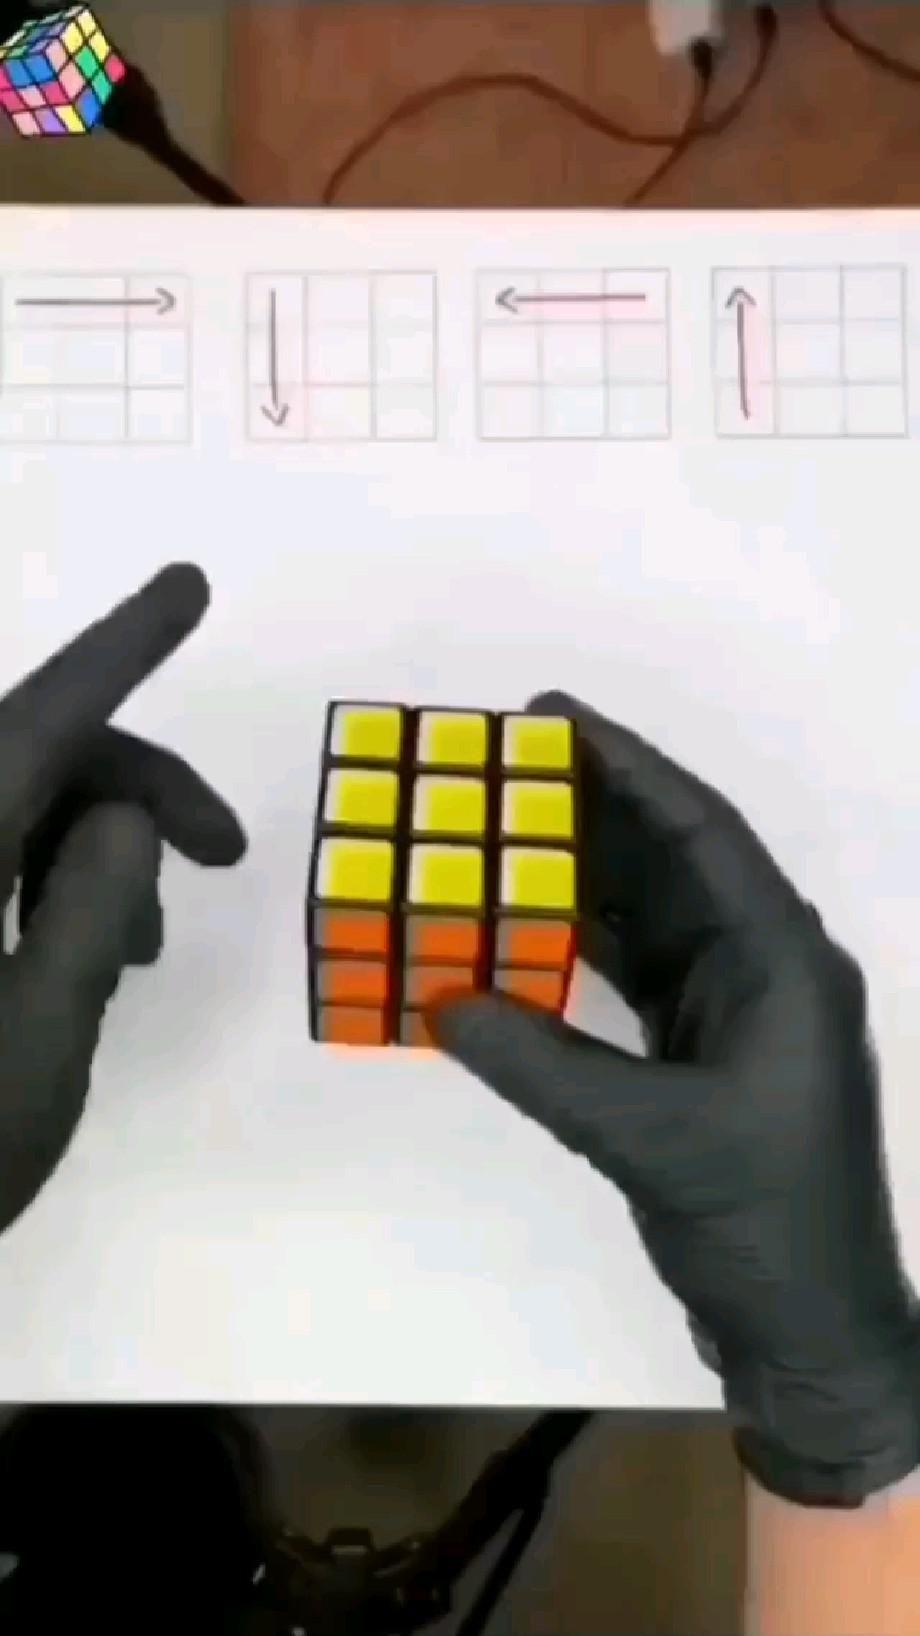 Rubik's Cube trick tutorial easy trick to solve Rubik's Cube easy life hacks